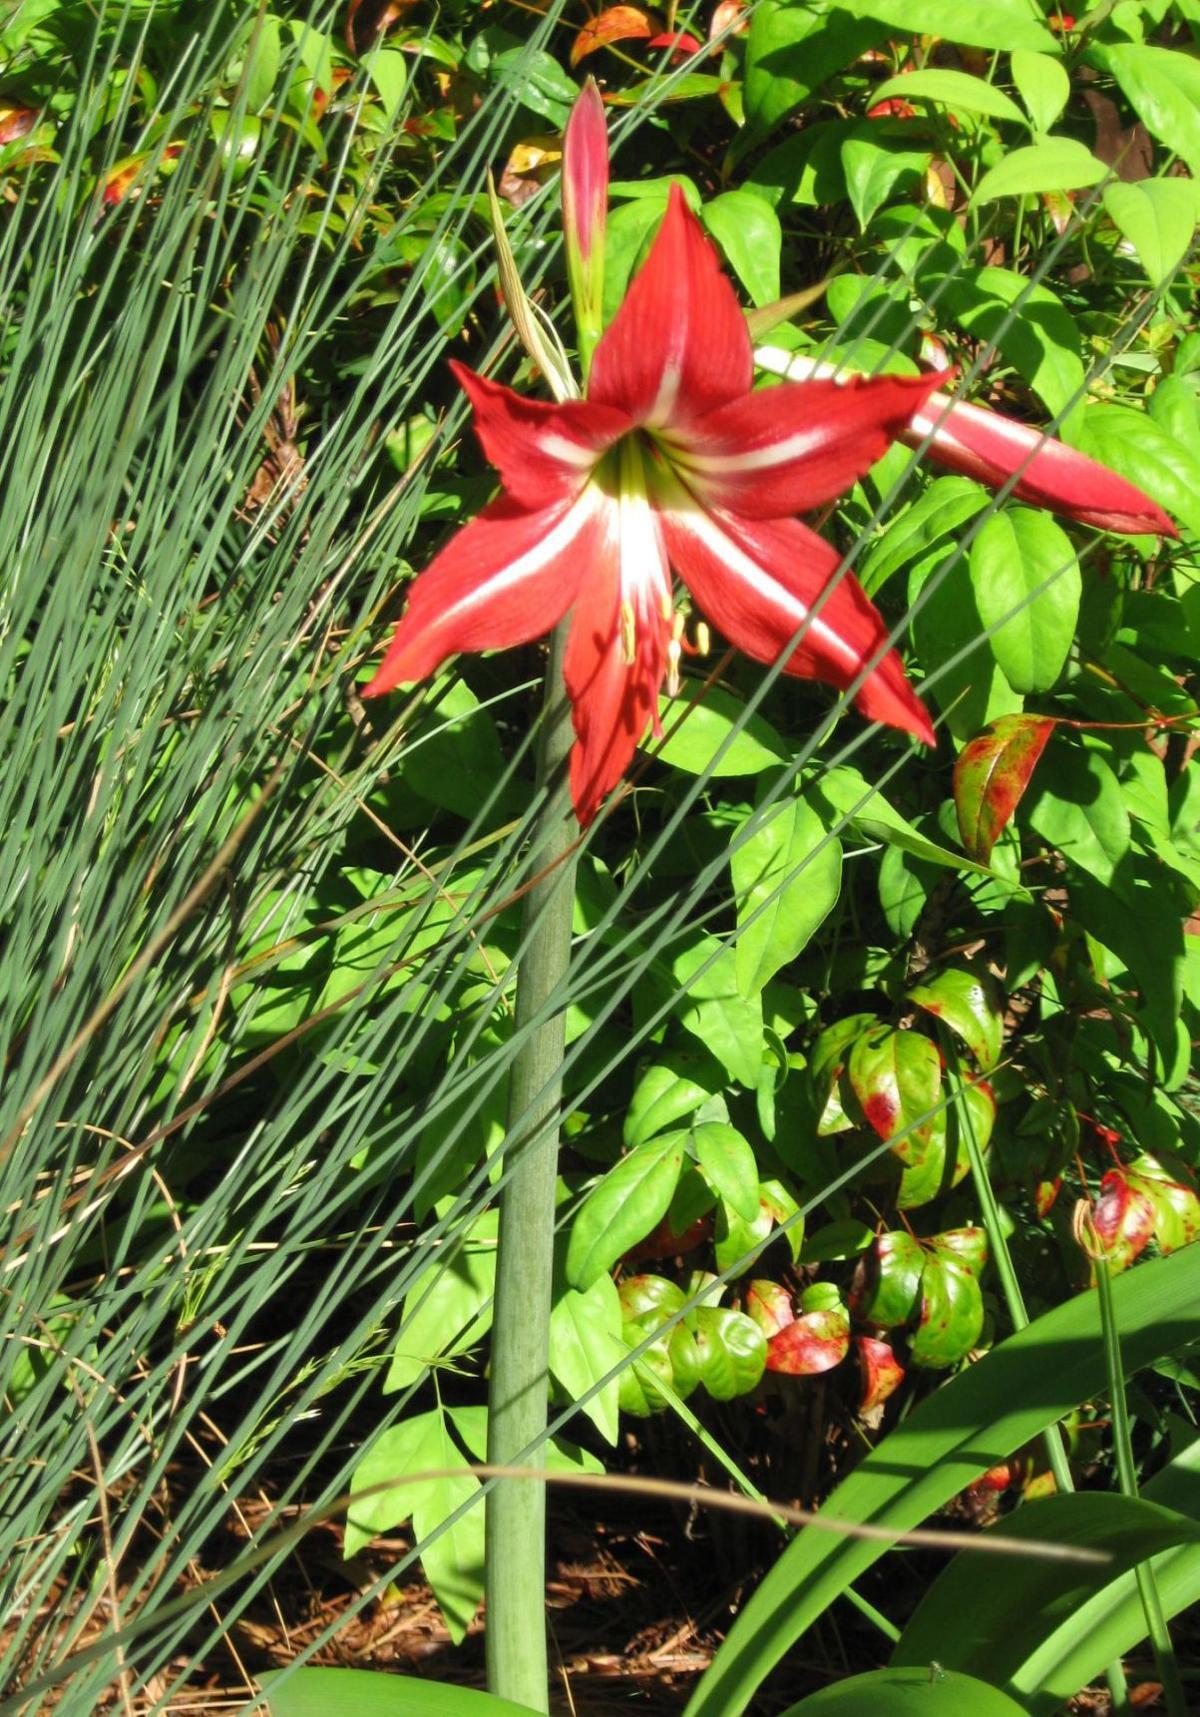 Recalling a timeless Southern gardener